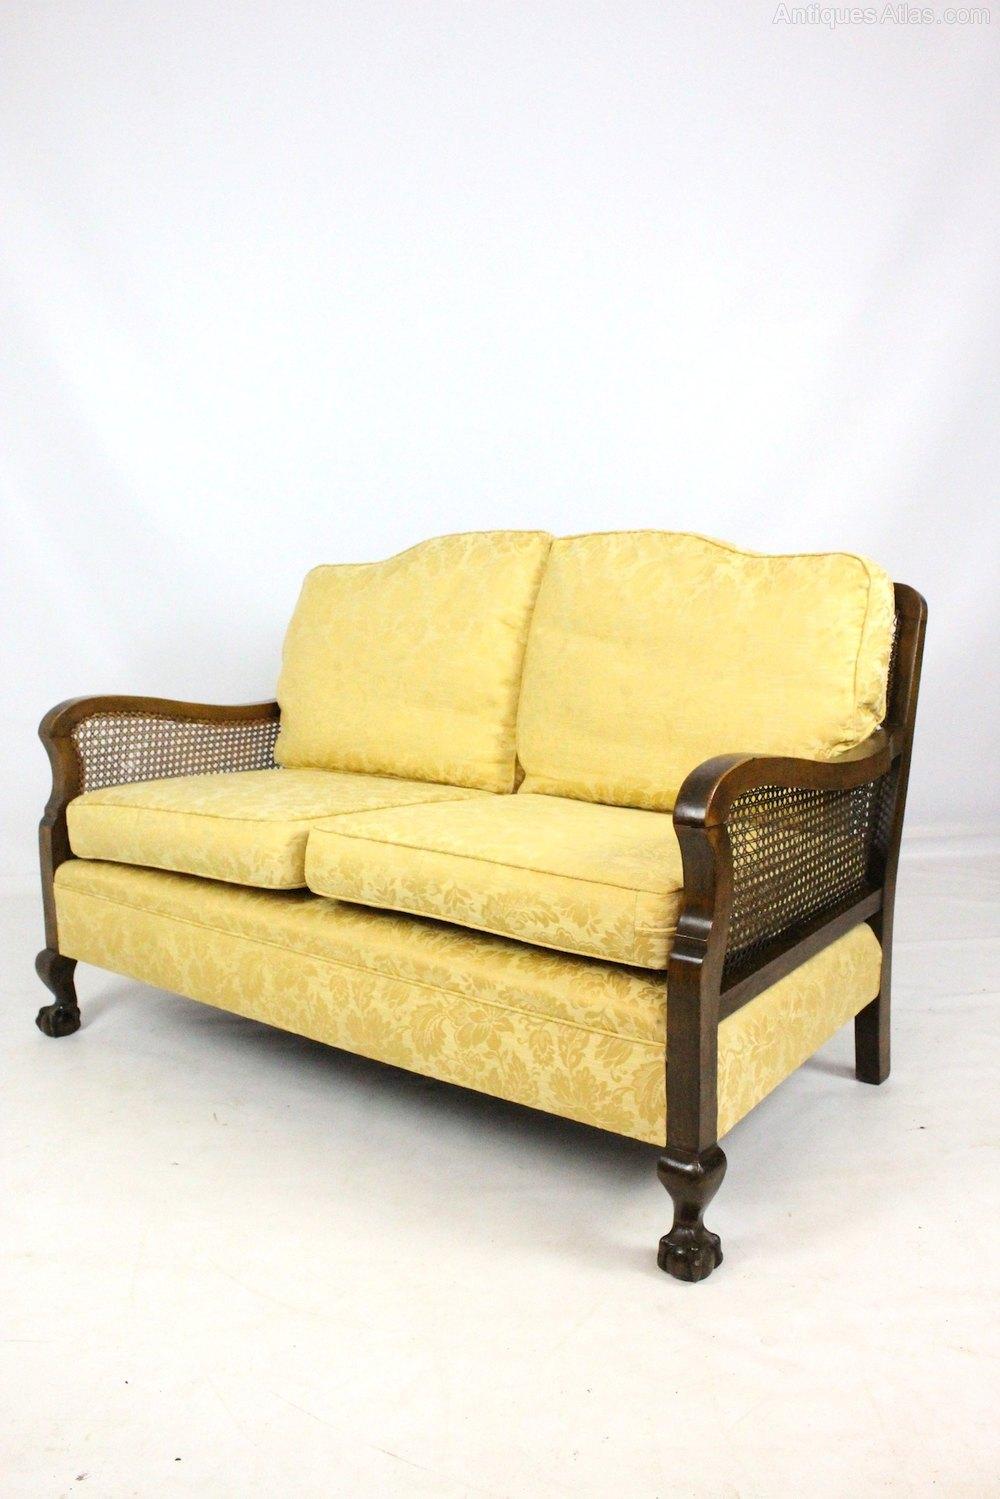 Walnut 2 Seater Bergere Cane Sofa Settee ...